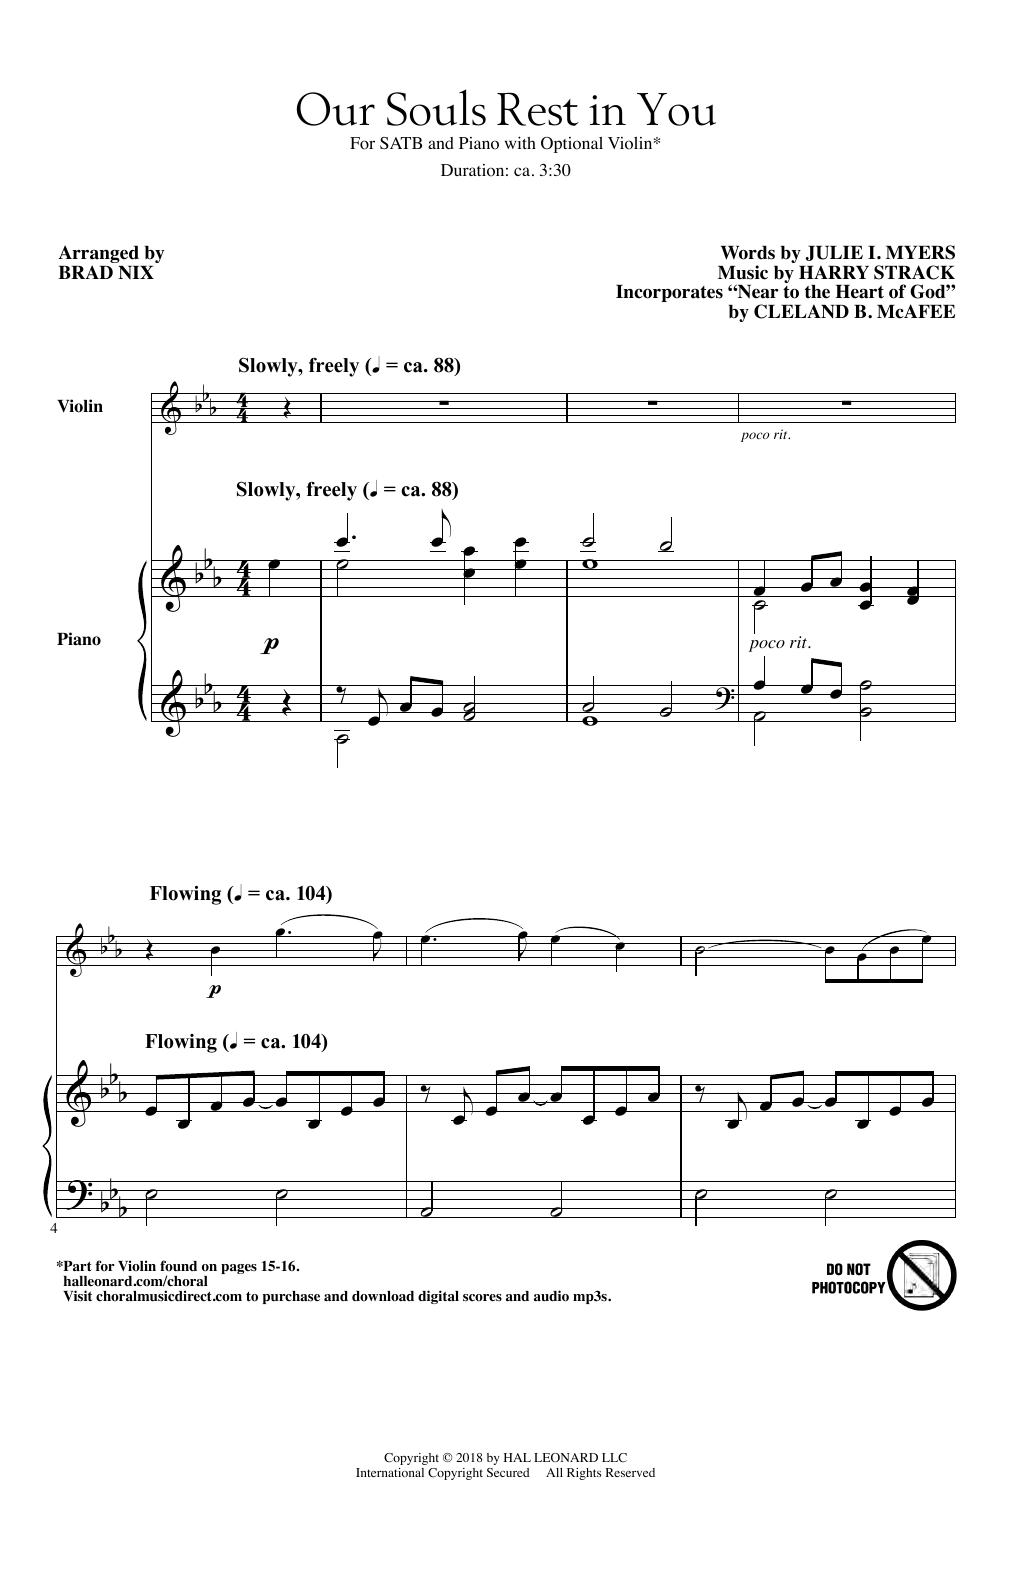 Our Souls Rest In You (arr. Brad Nix) (SATB Choir)